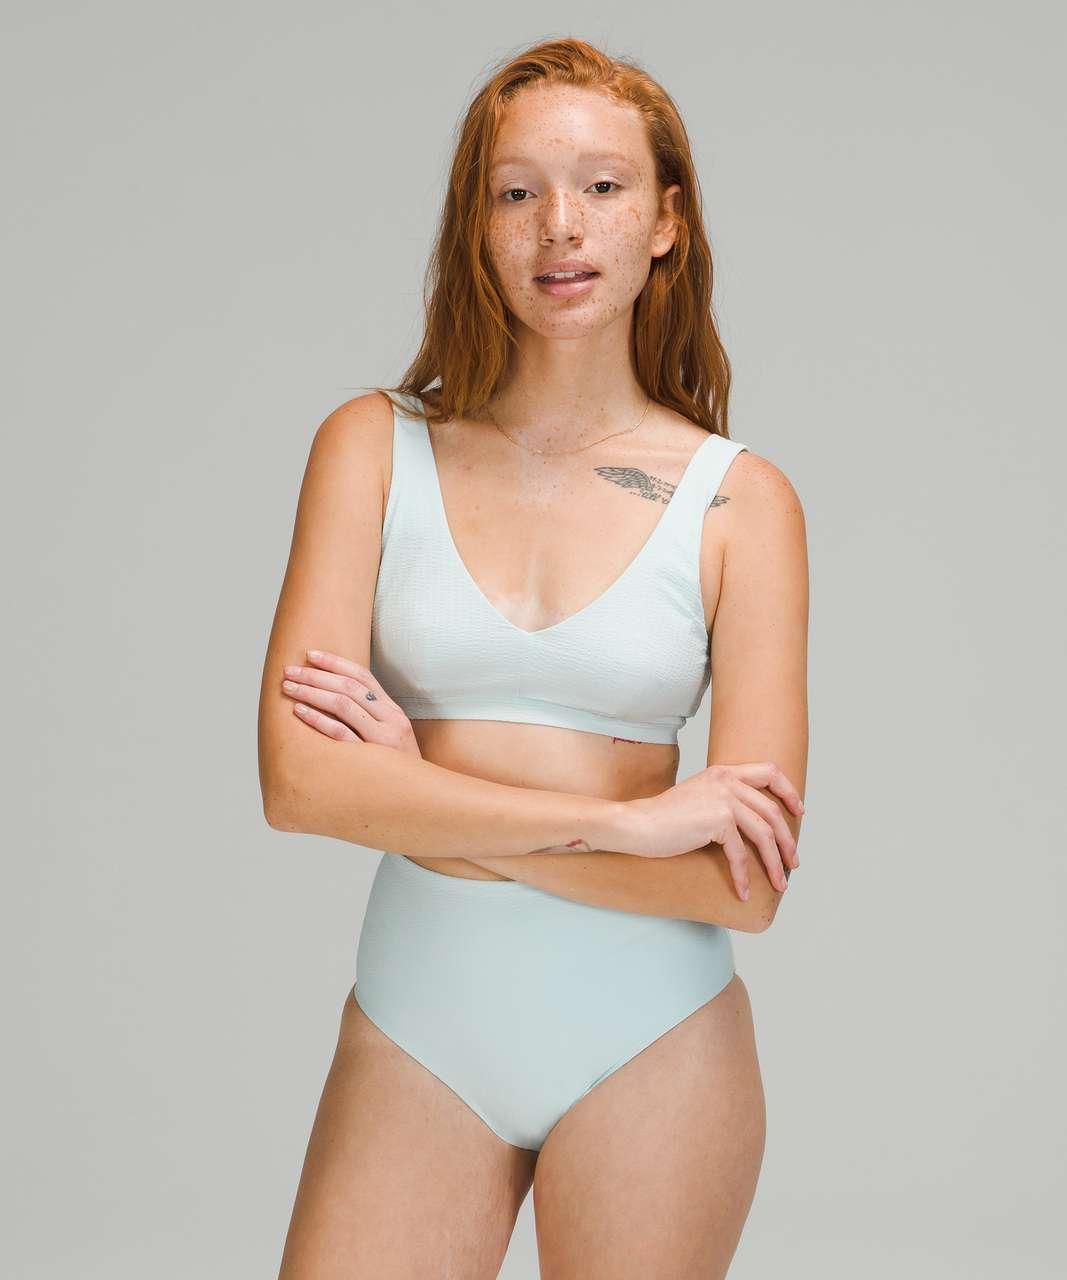 Lululemon Waterside V Seersucker Swim Top *C/D Cups - Sheer Blue